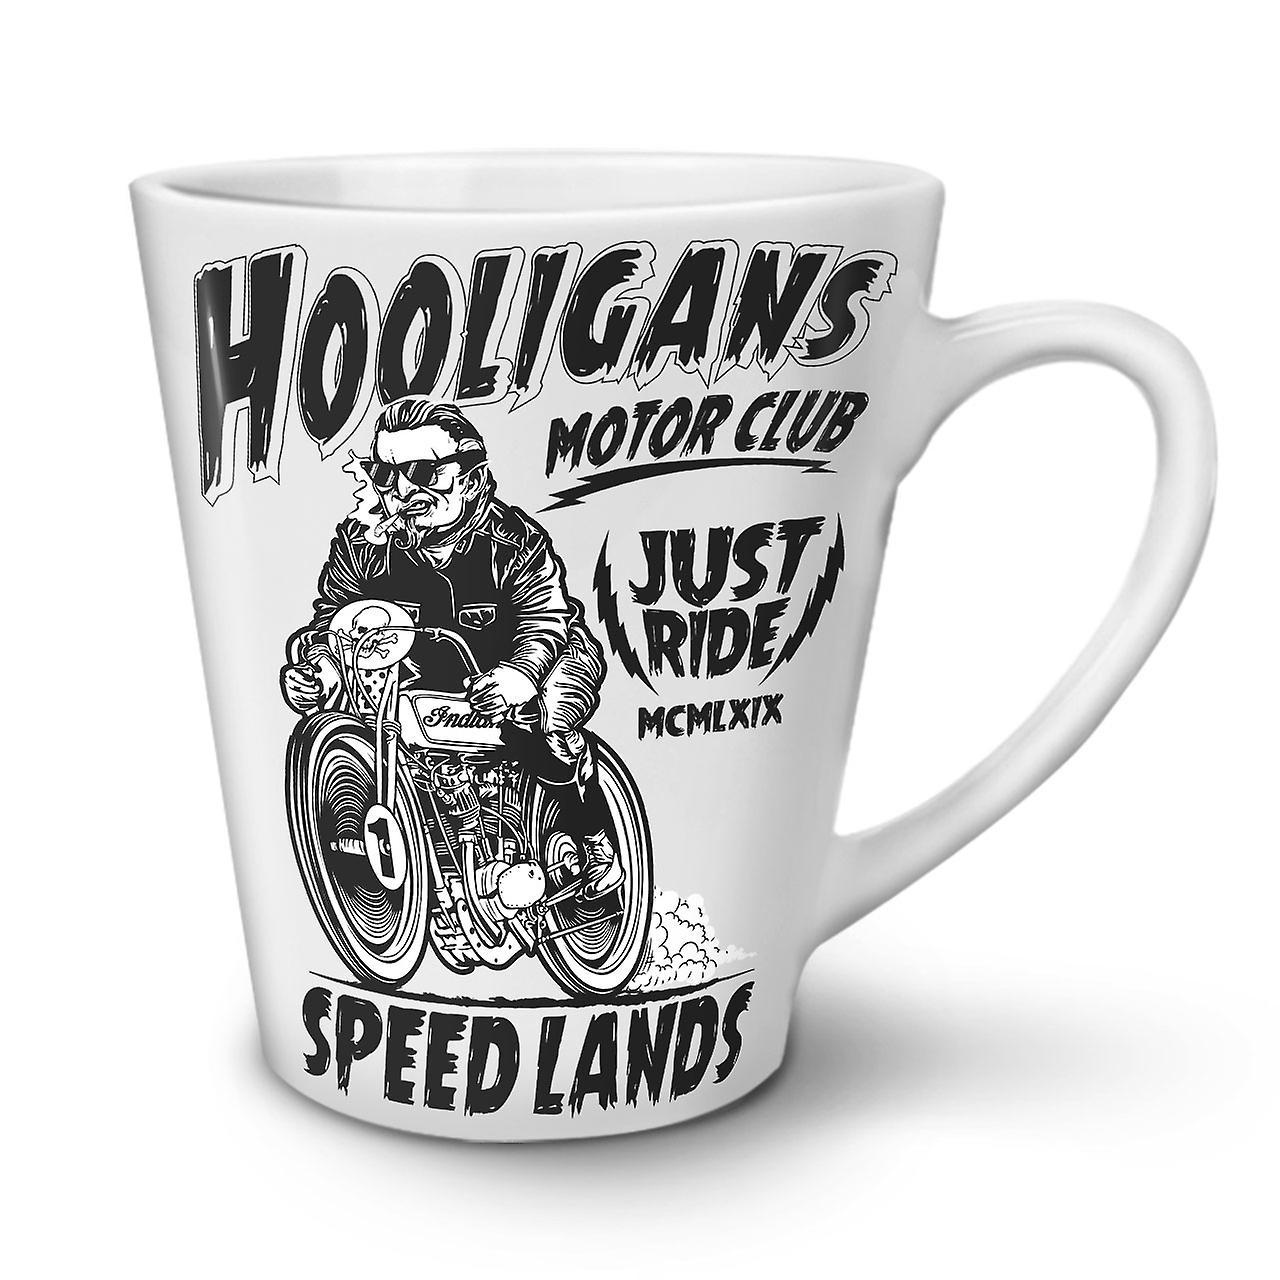 Nouvelle Hooligans OzWellcoda Blanche Latte En Café 12 Motor Club Céramique Tasse 92eDYHWEI